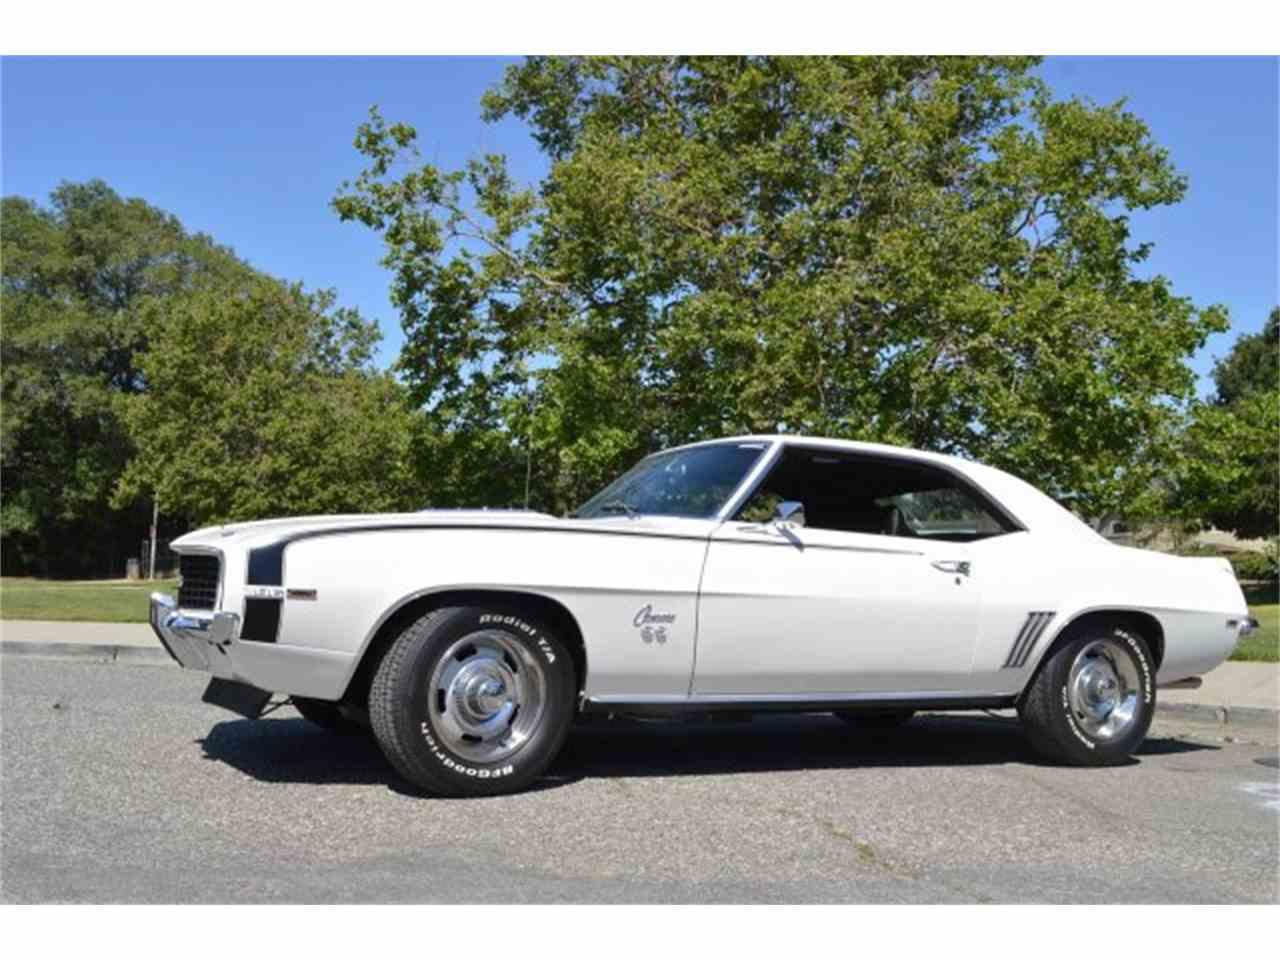 1969 Chevrolet Camaro Rs Ss For Sale Classiccars Com